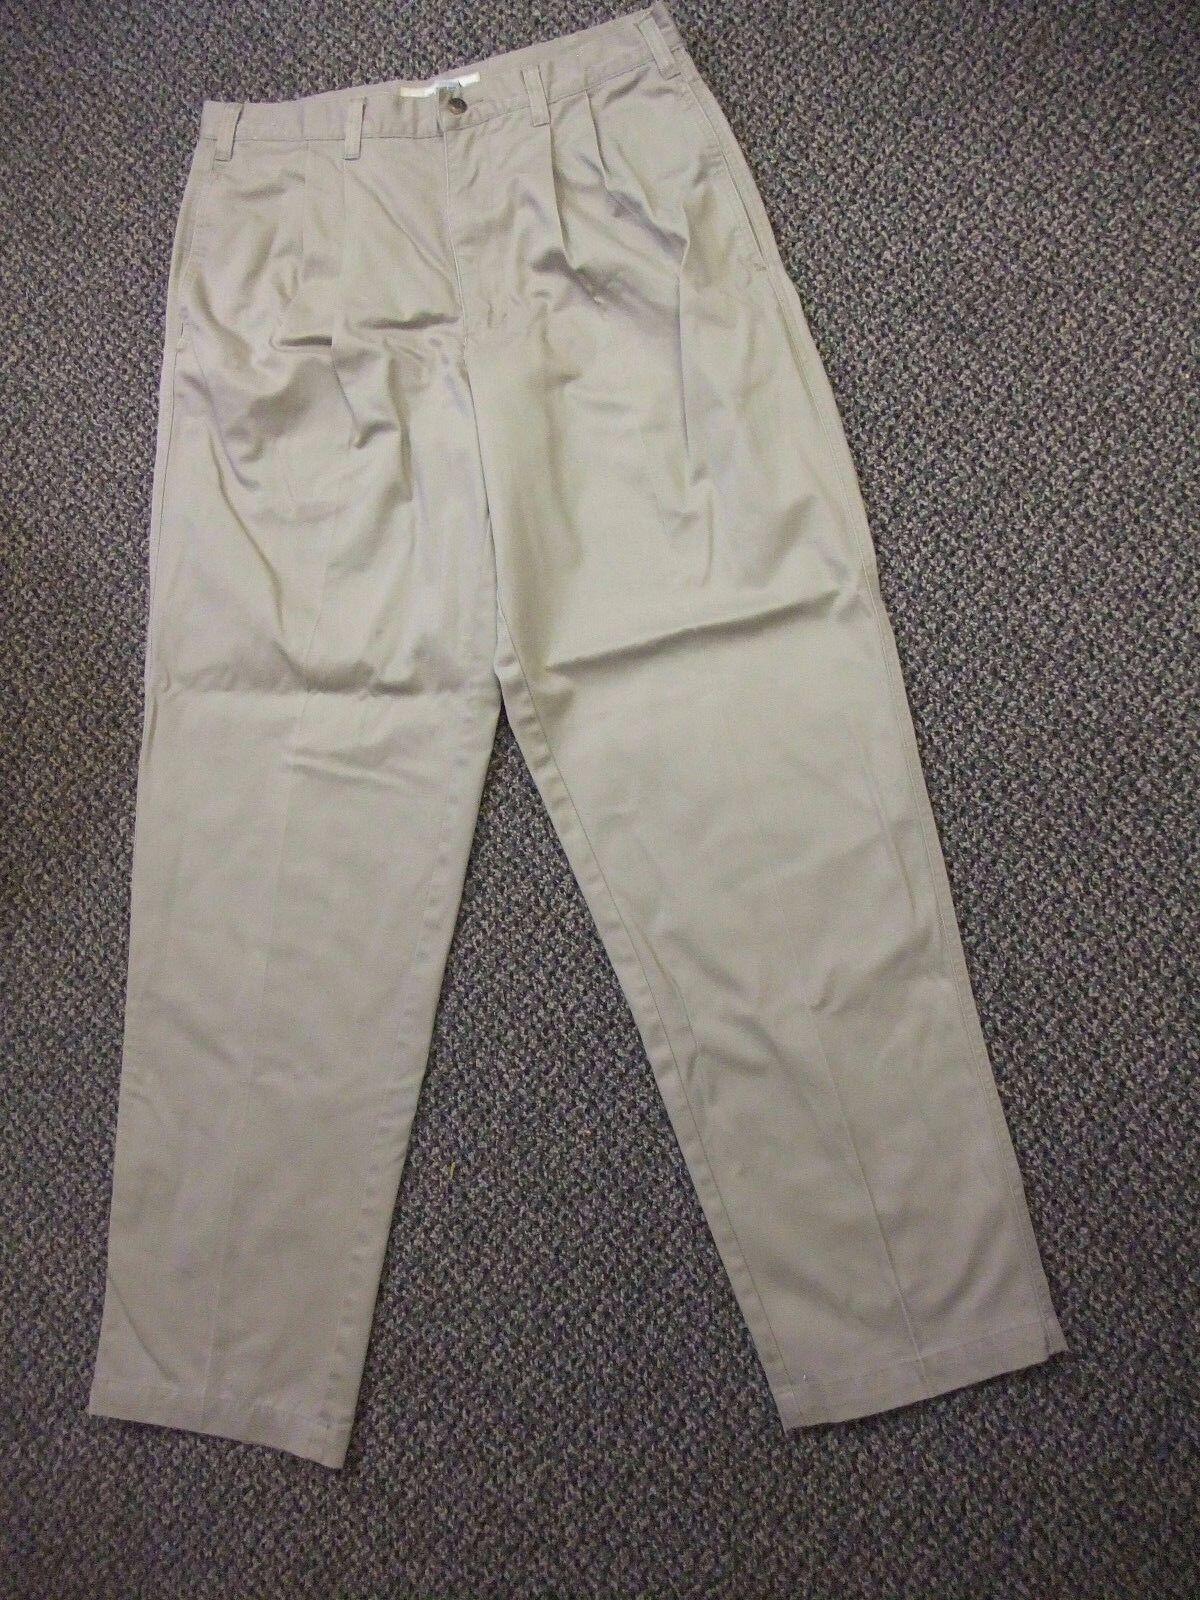 Vintage Cherokee Khakis Casual Dress Pants Men's Size 34x34